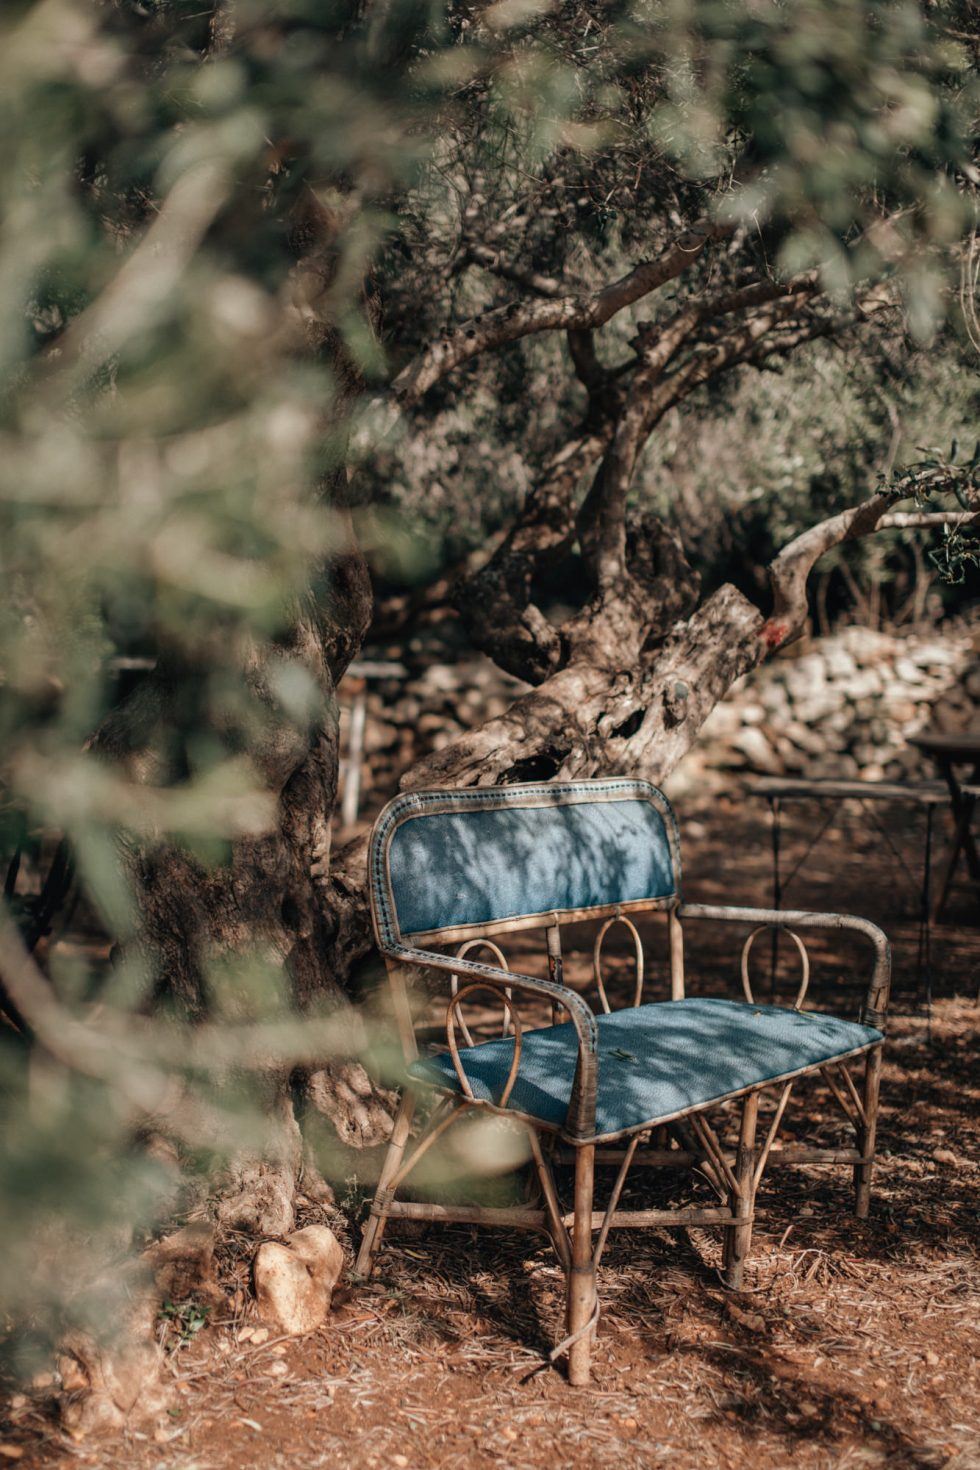 malta-travel-lifestyle-photographer-laura-g-diaz-10